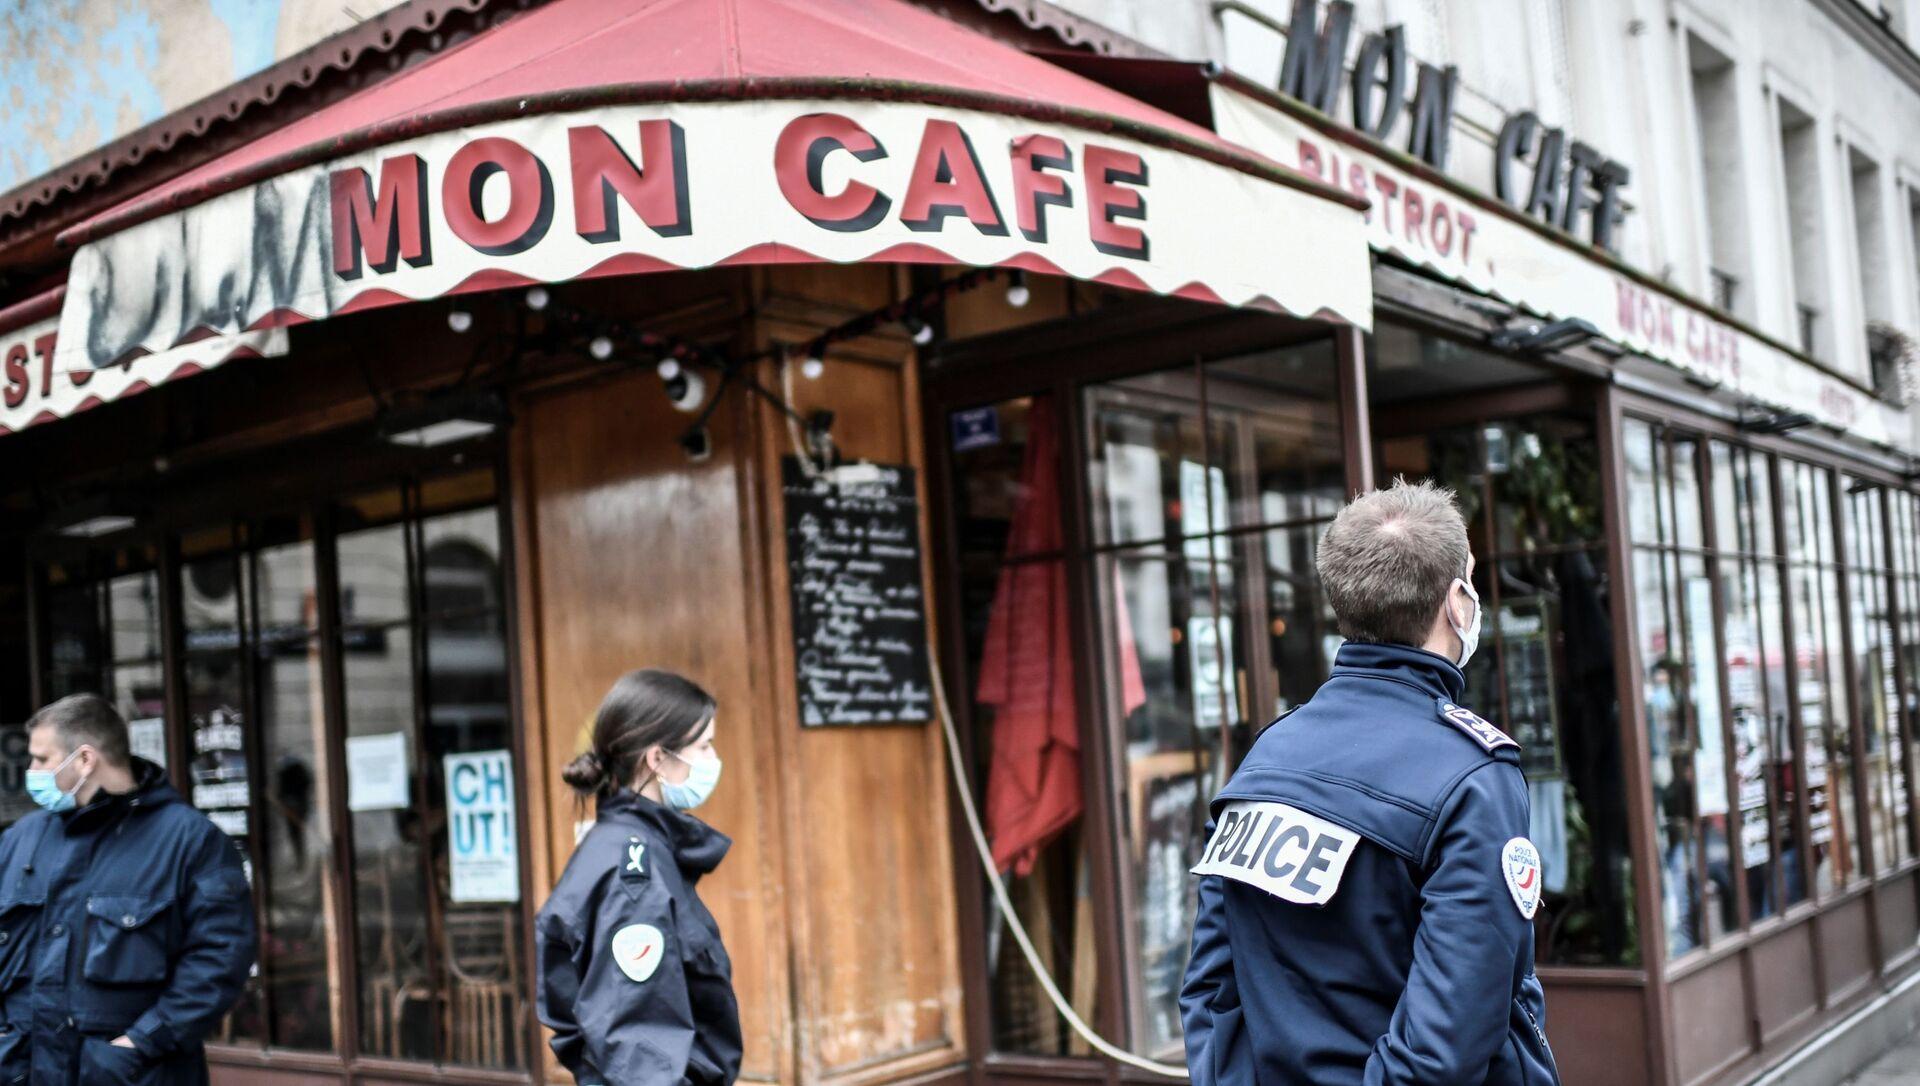 Policías franceses custodian un bar de París - Sputnik Mundo, 1920, 05.02.2021